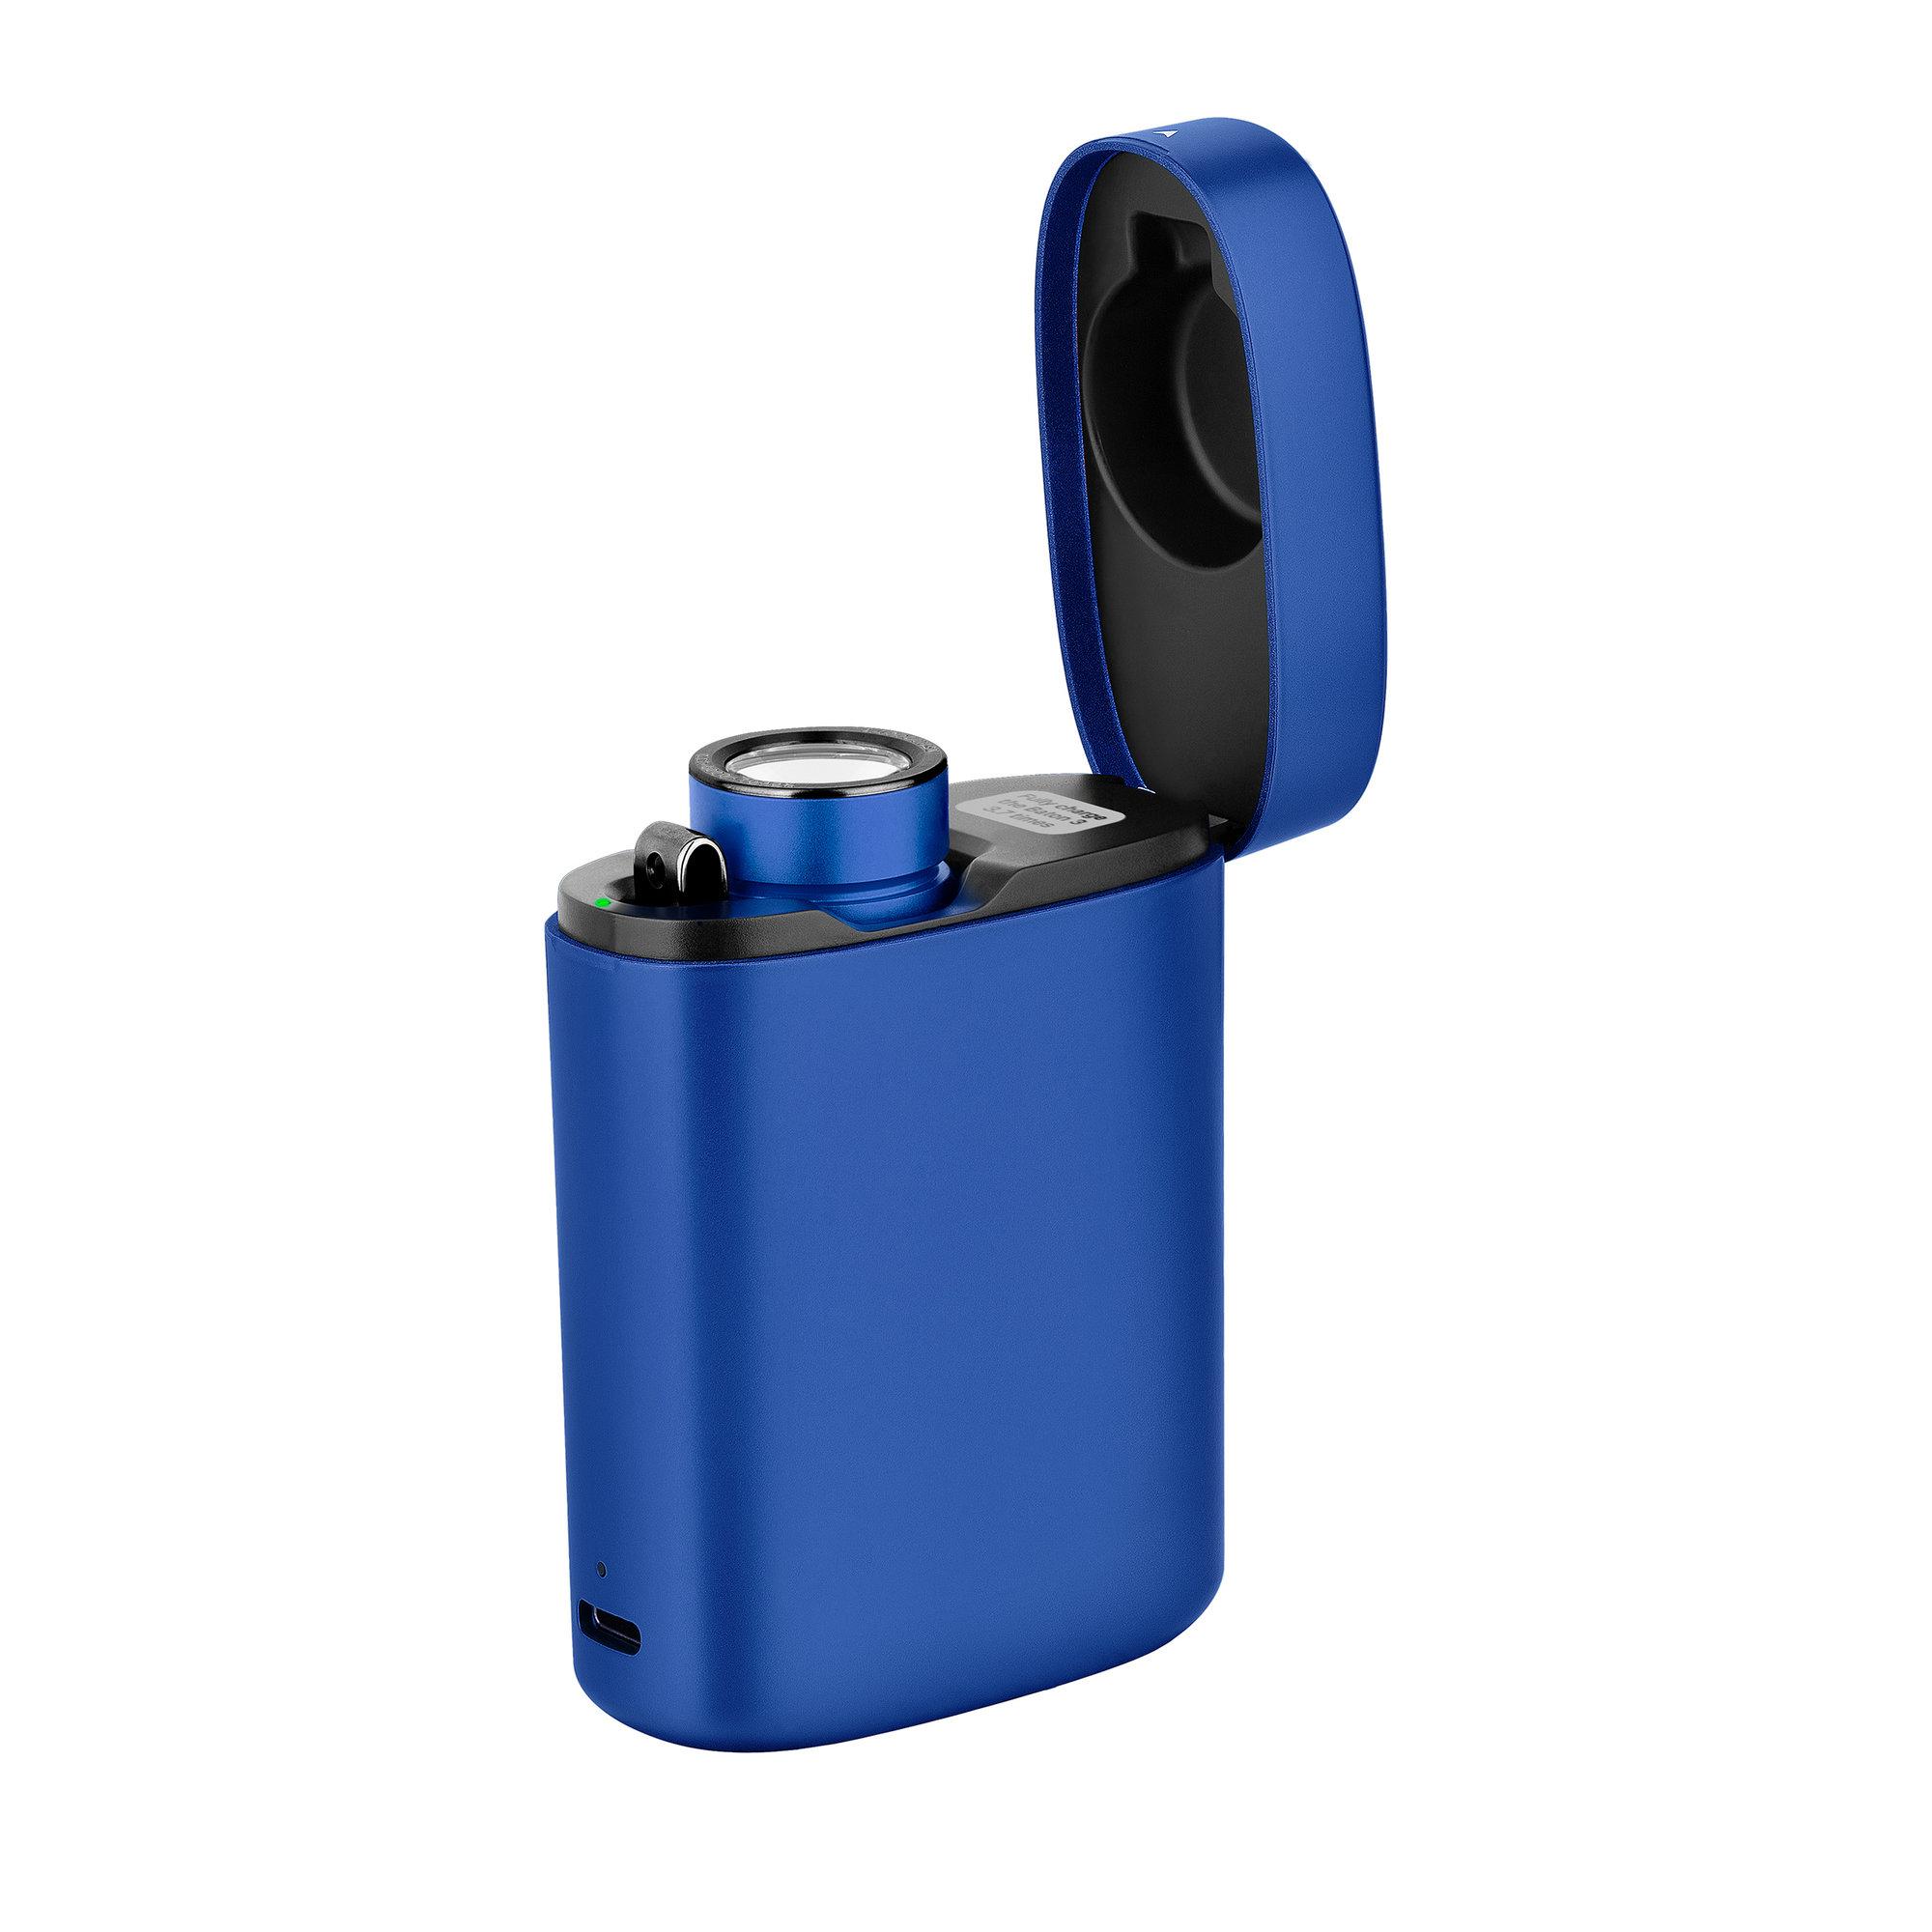 LED baterka Olight Baton 3 Blue Premium Edition 1200 lm - limitovaná edícia